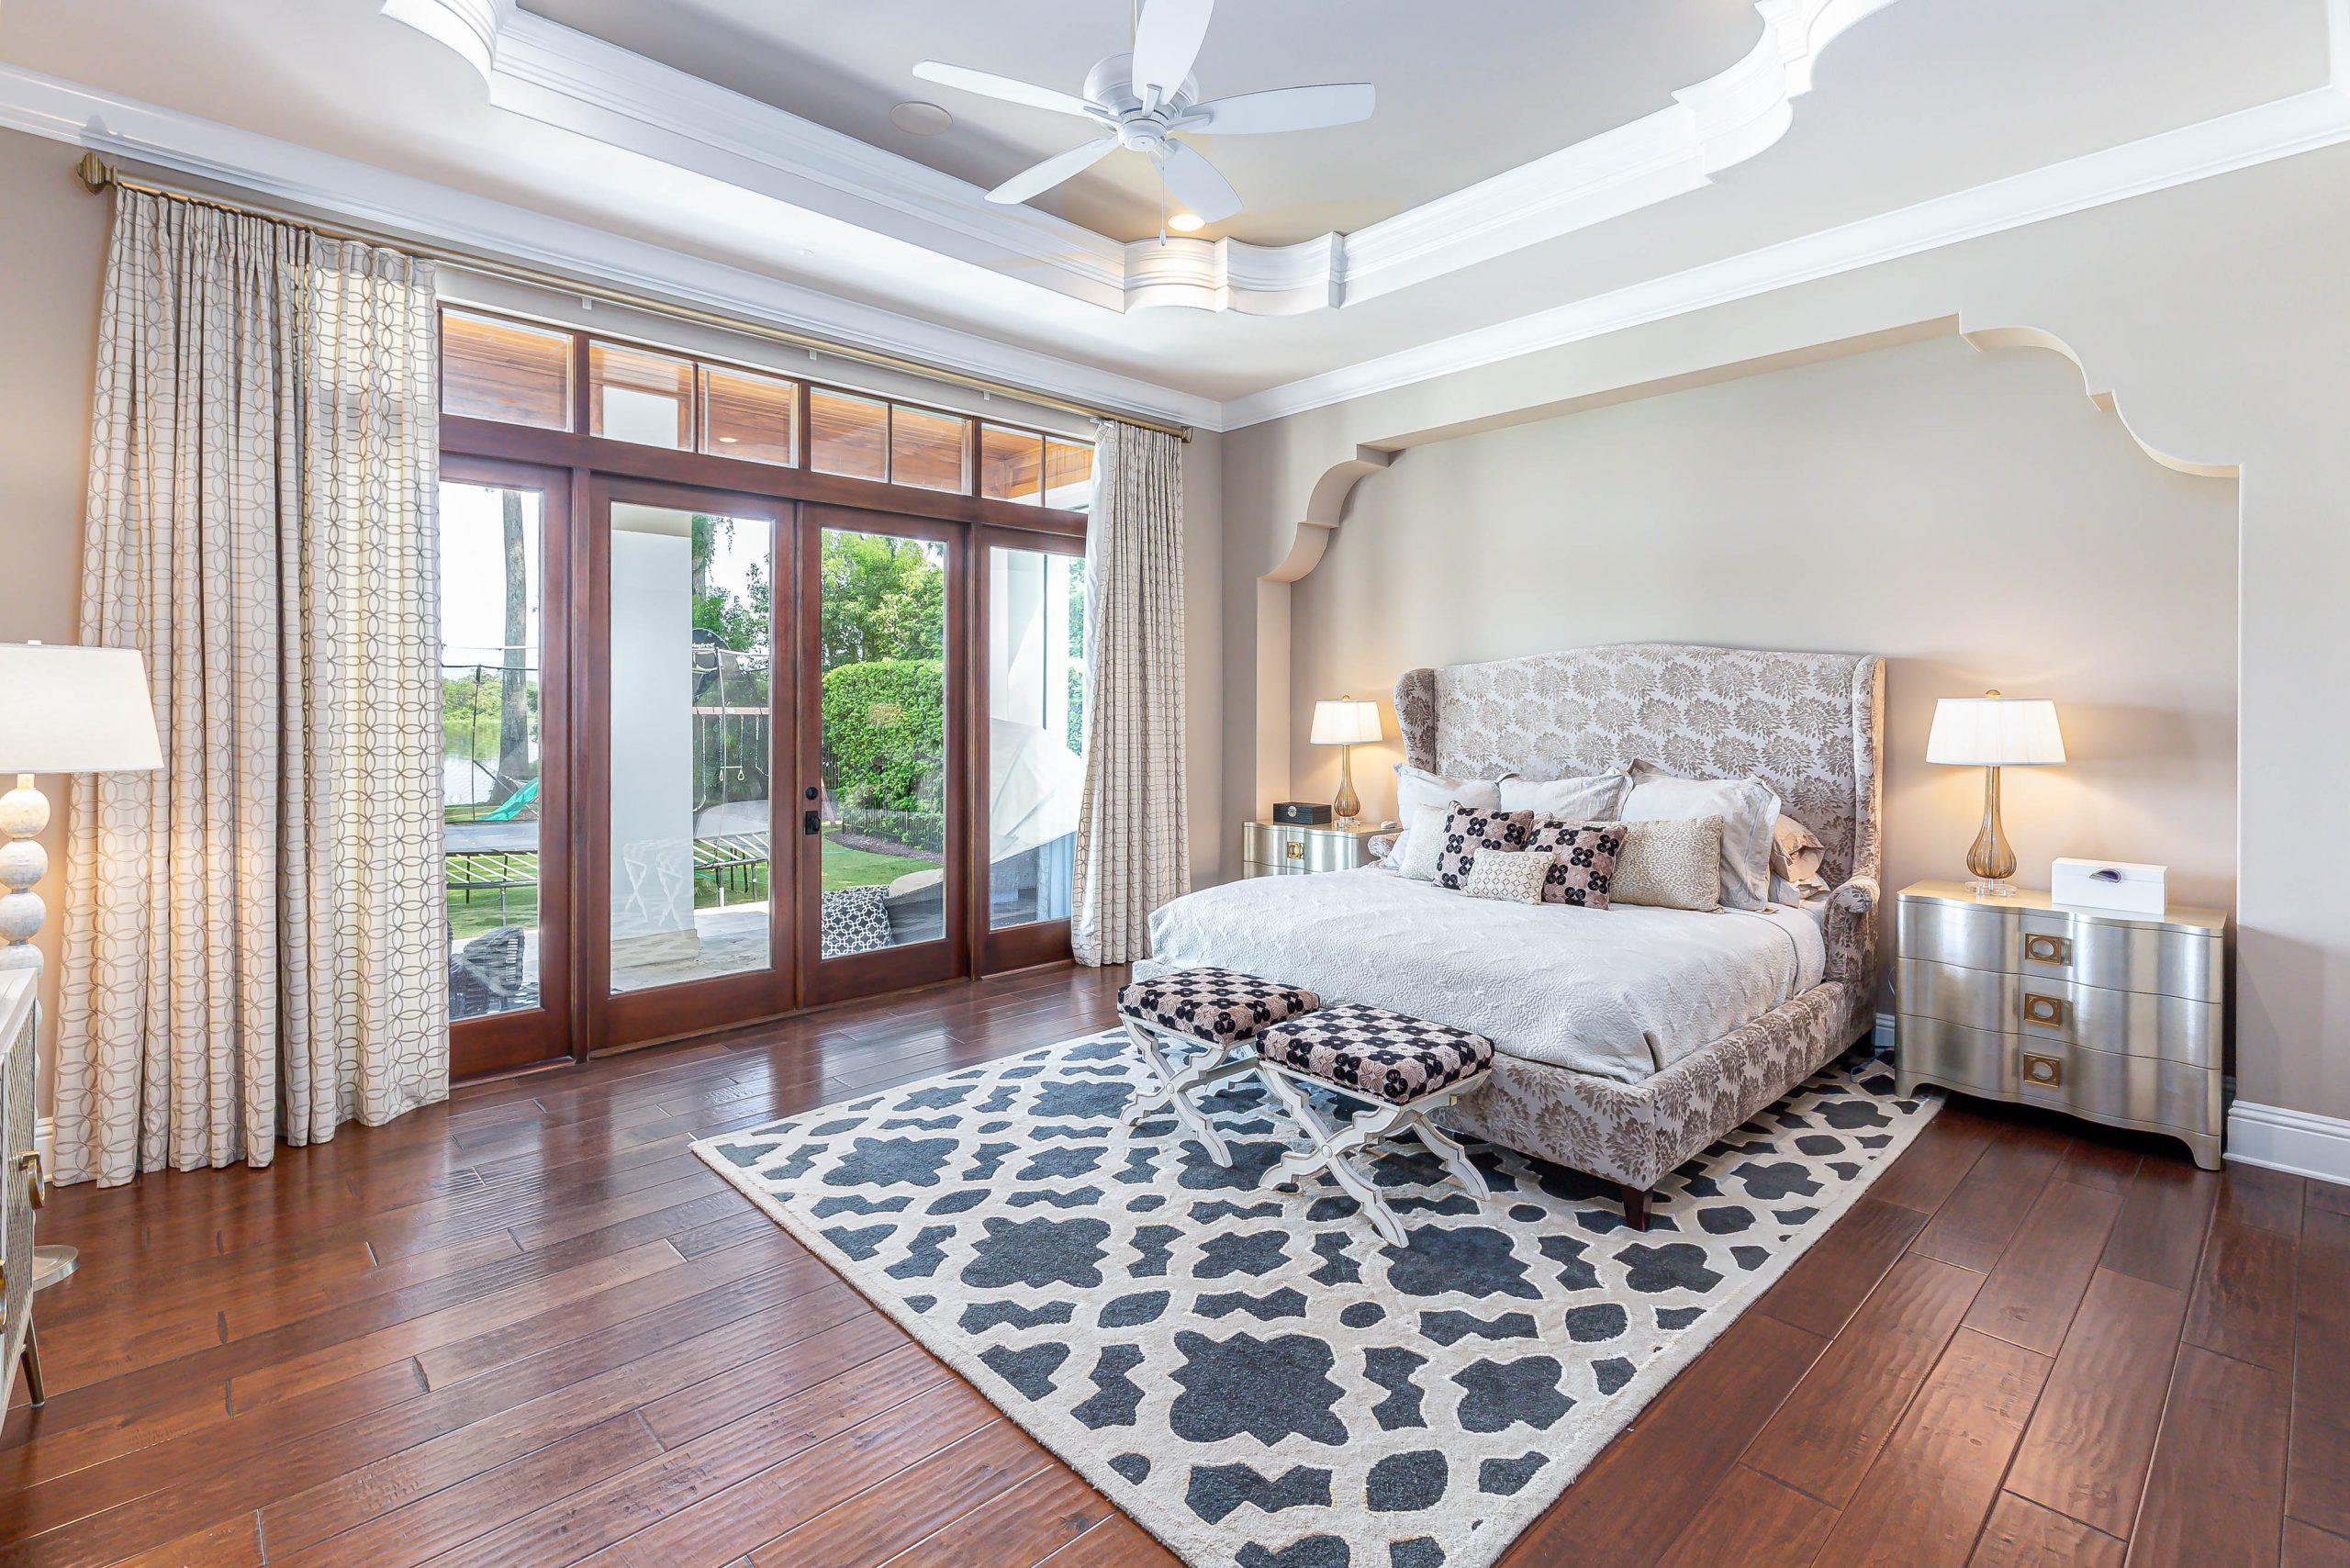 bedroom in custom home built by Einheit home builders in Orlando